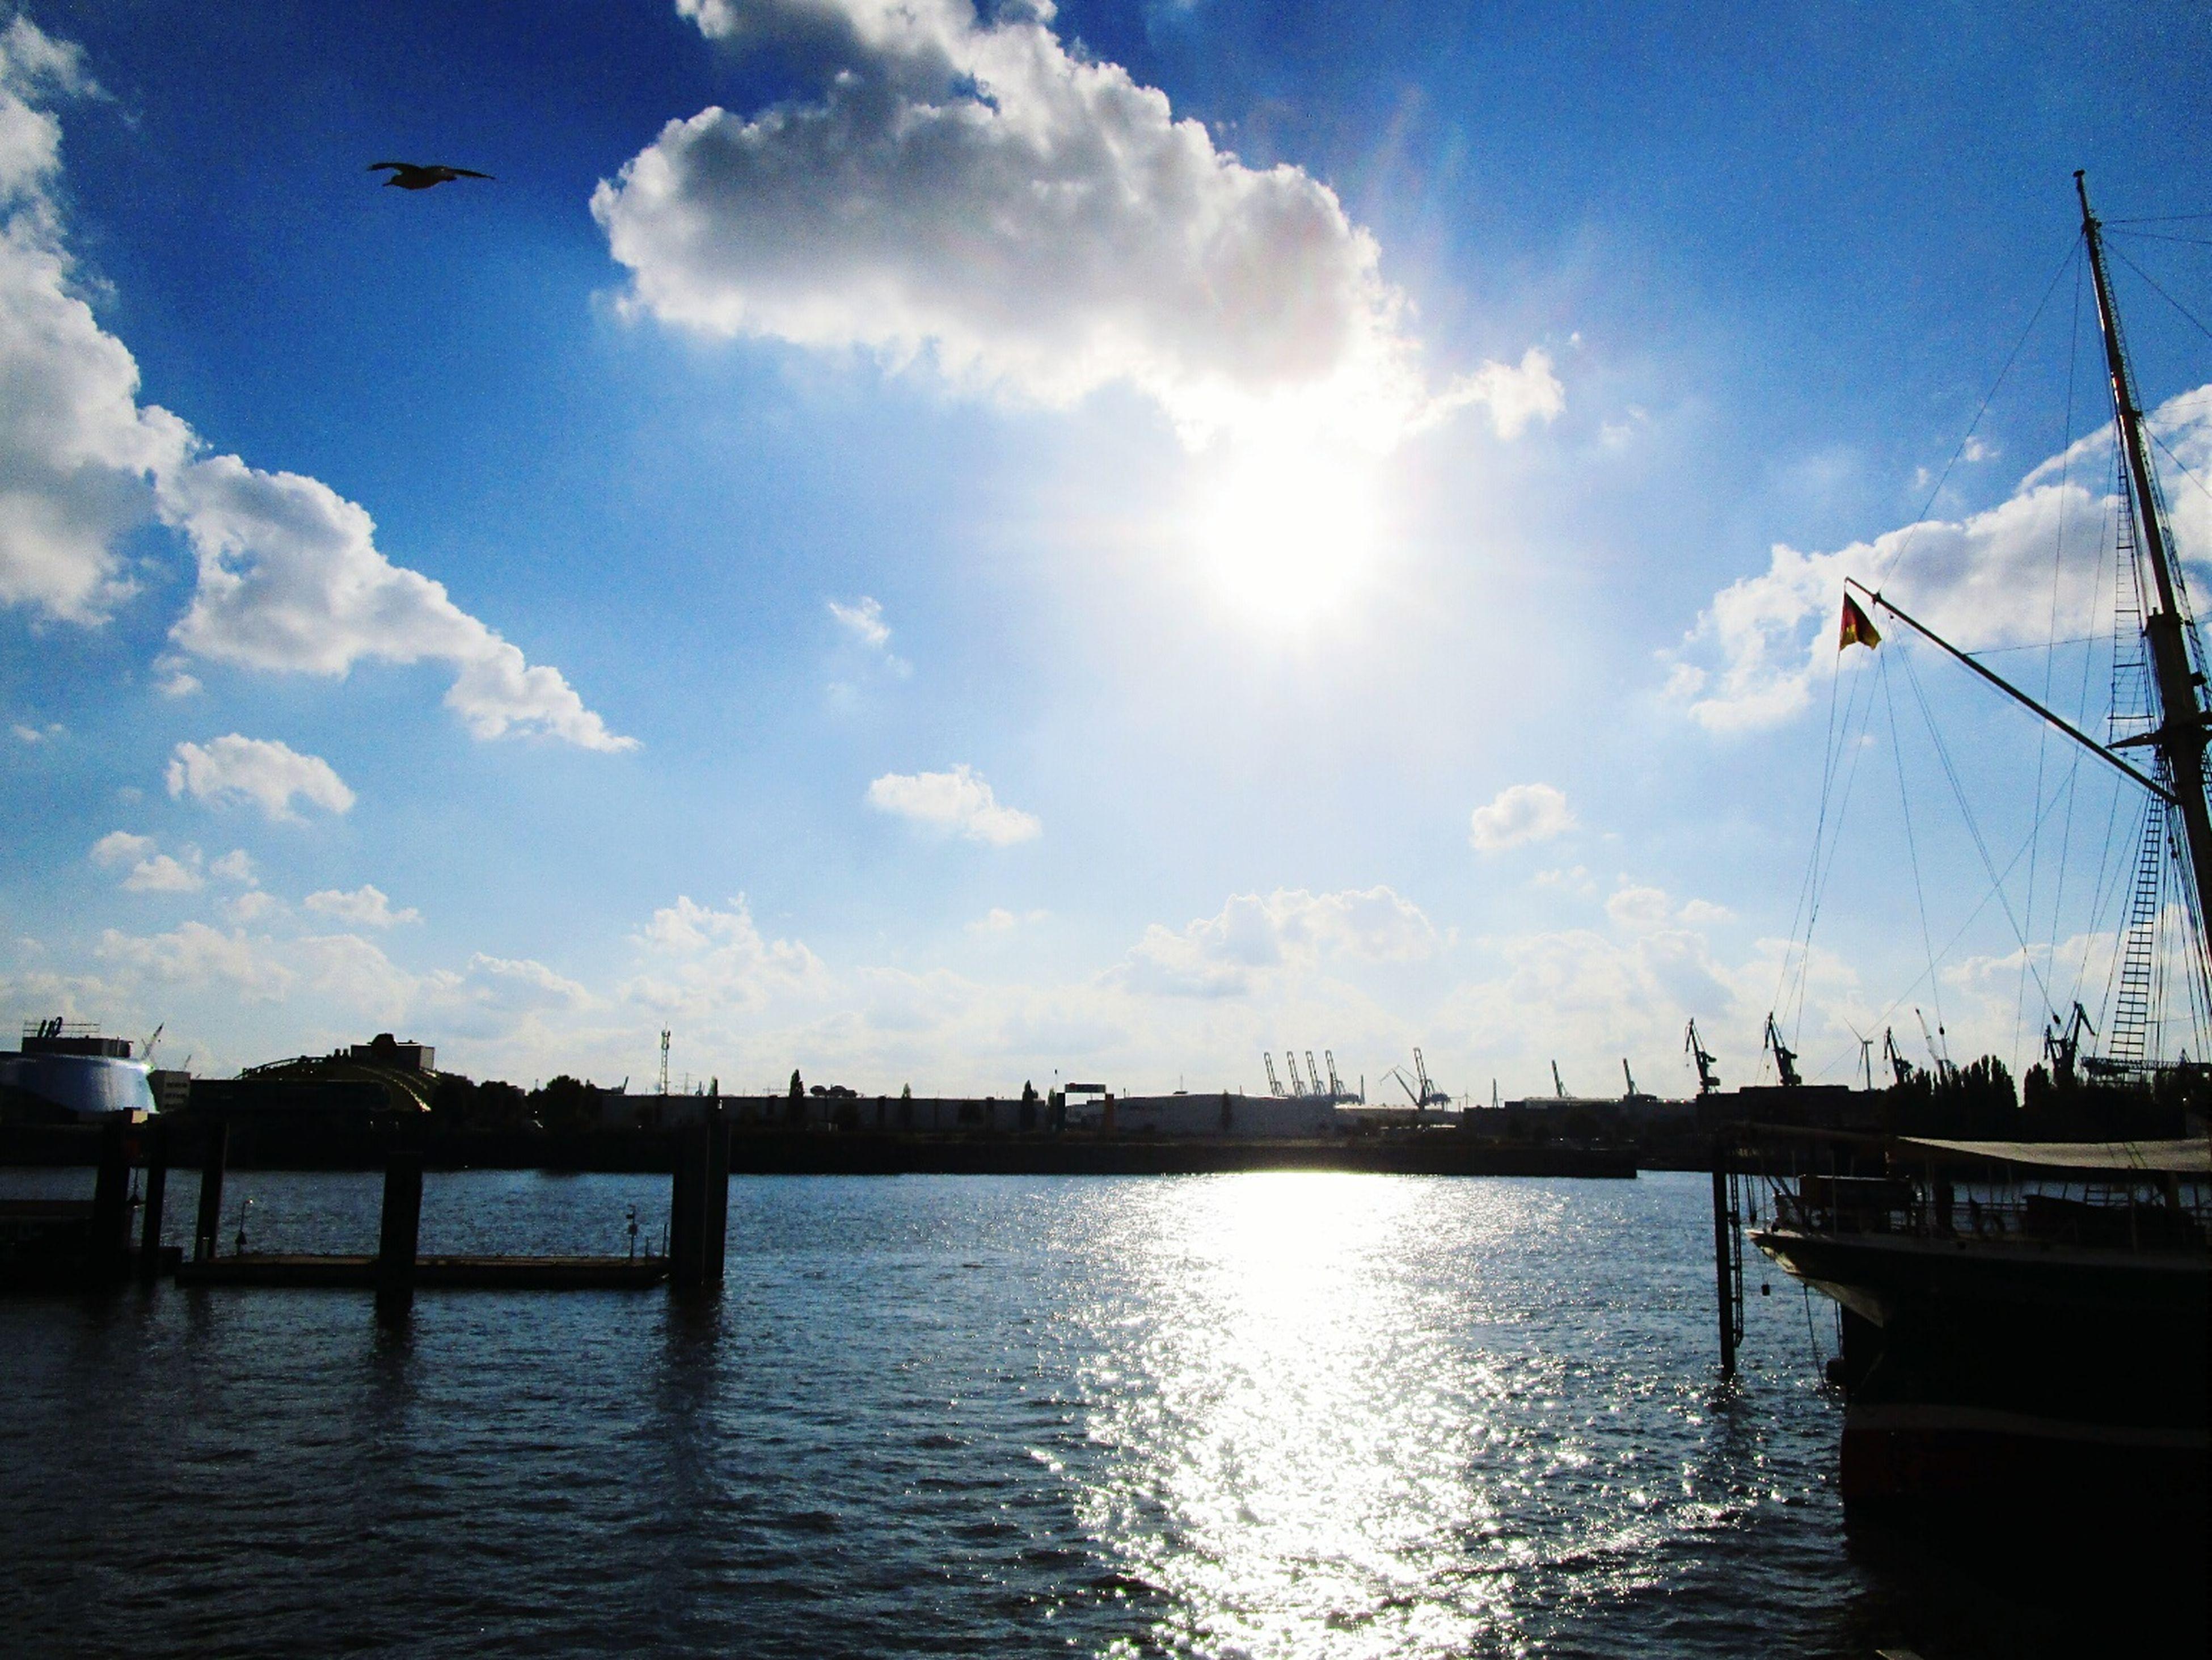 water, sky, sea, waterfront, sun, transportation, cloud - sky, sunlight, nautical vessel, harbor, mode of transport, bird, cloud, sunbeam, reflection, blue, river, nature, built structure, silhouette